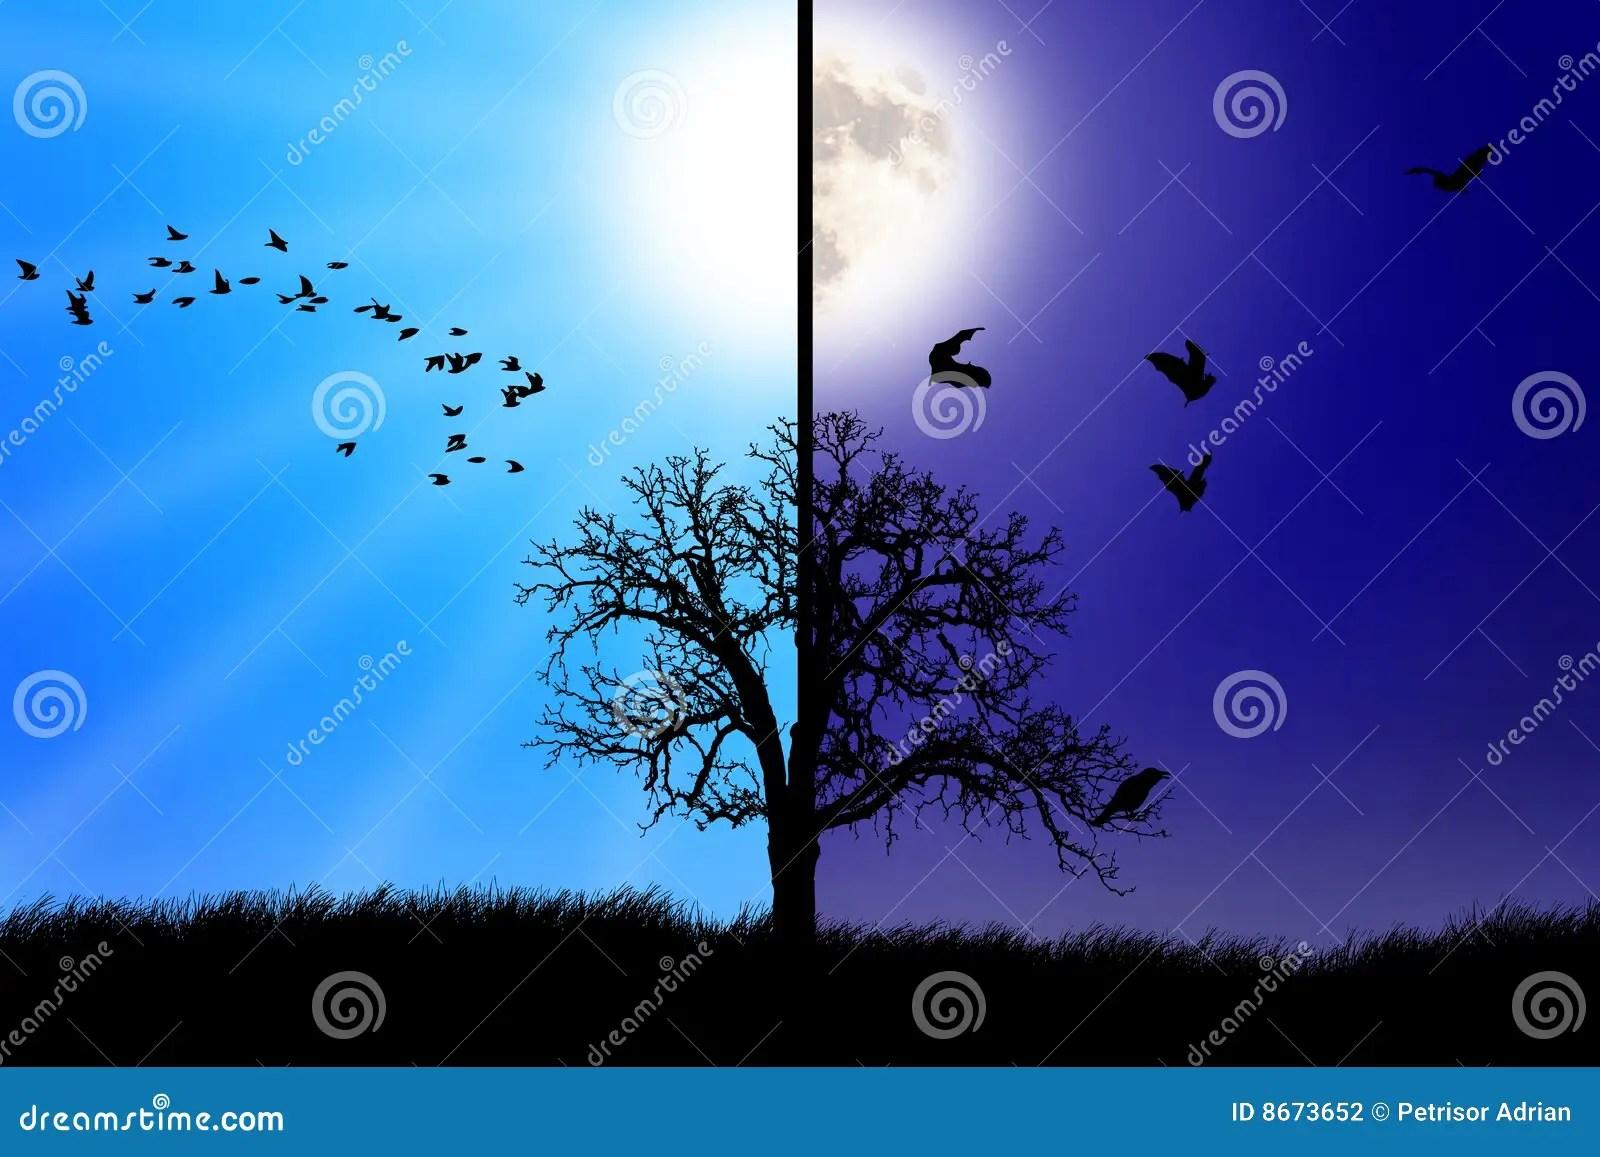 Day Versus Night Concept Stock Illustration Illustration Of Design